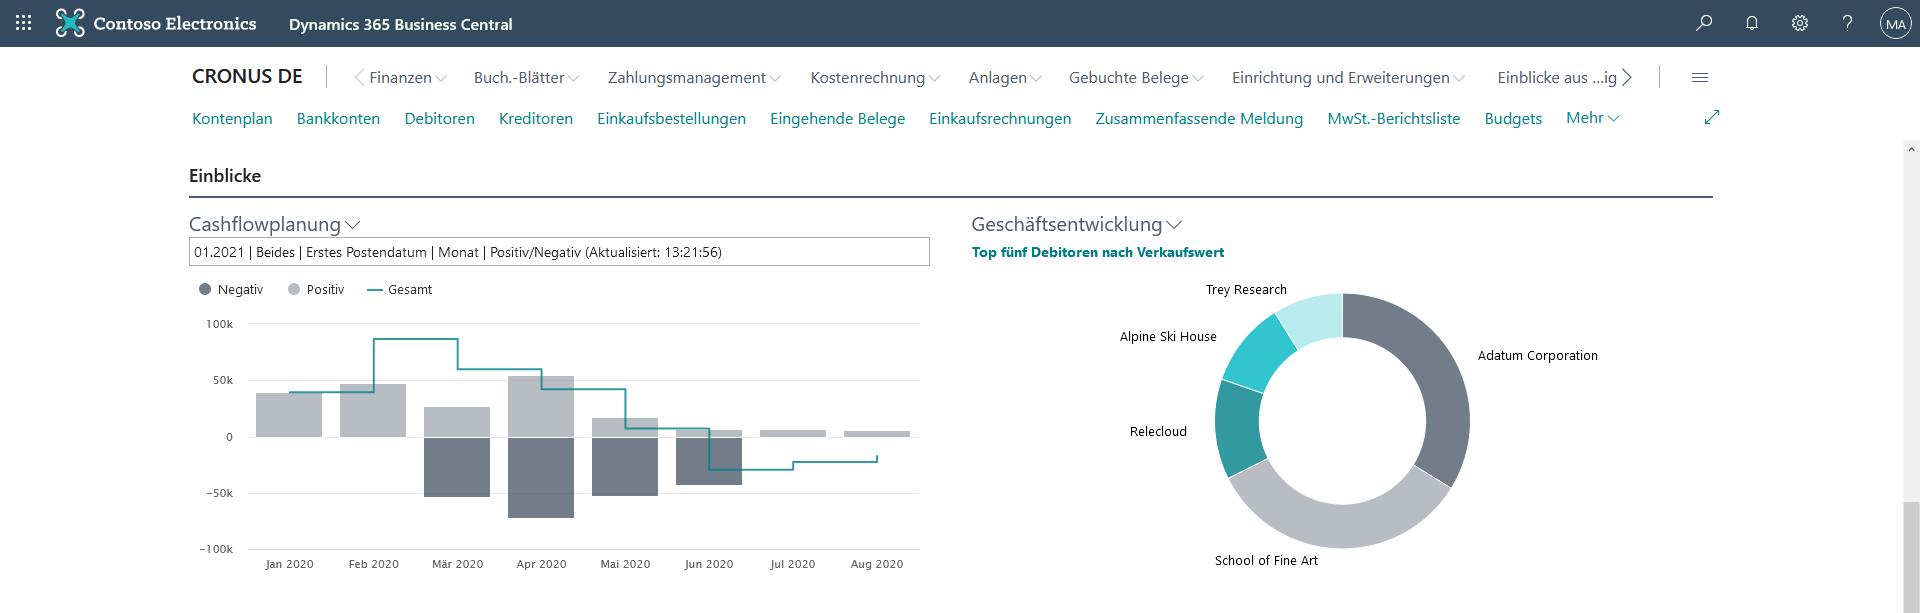 Cashflowplanung in Dynamics 365 Business Central - Cashflowarbeitsblatt - Dashboard